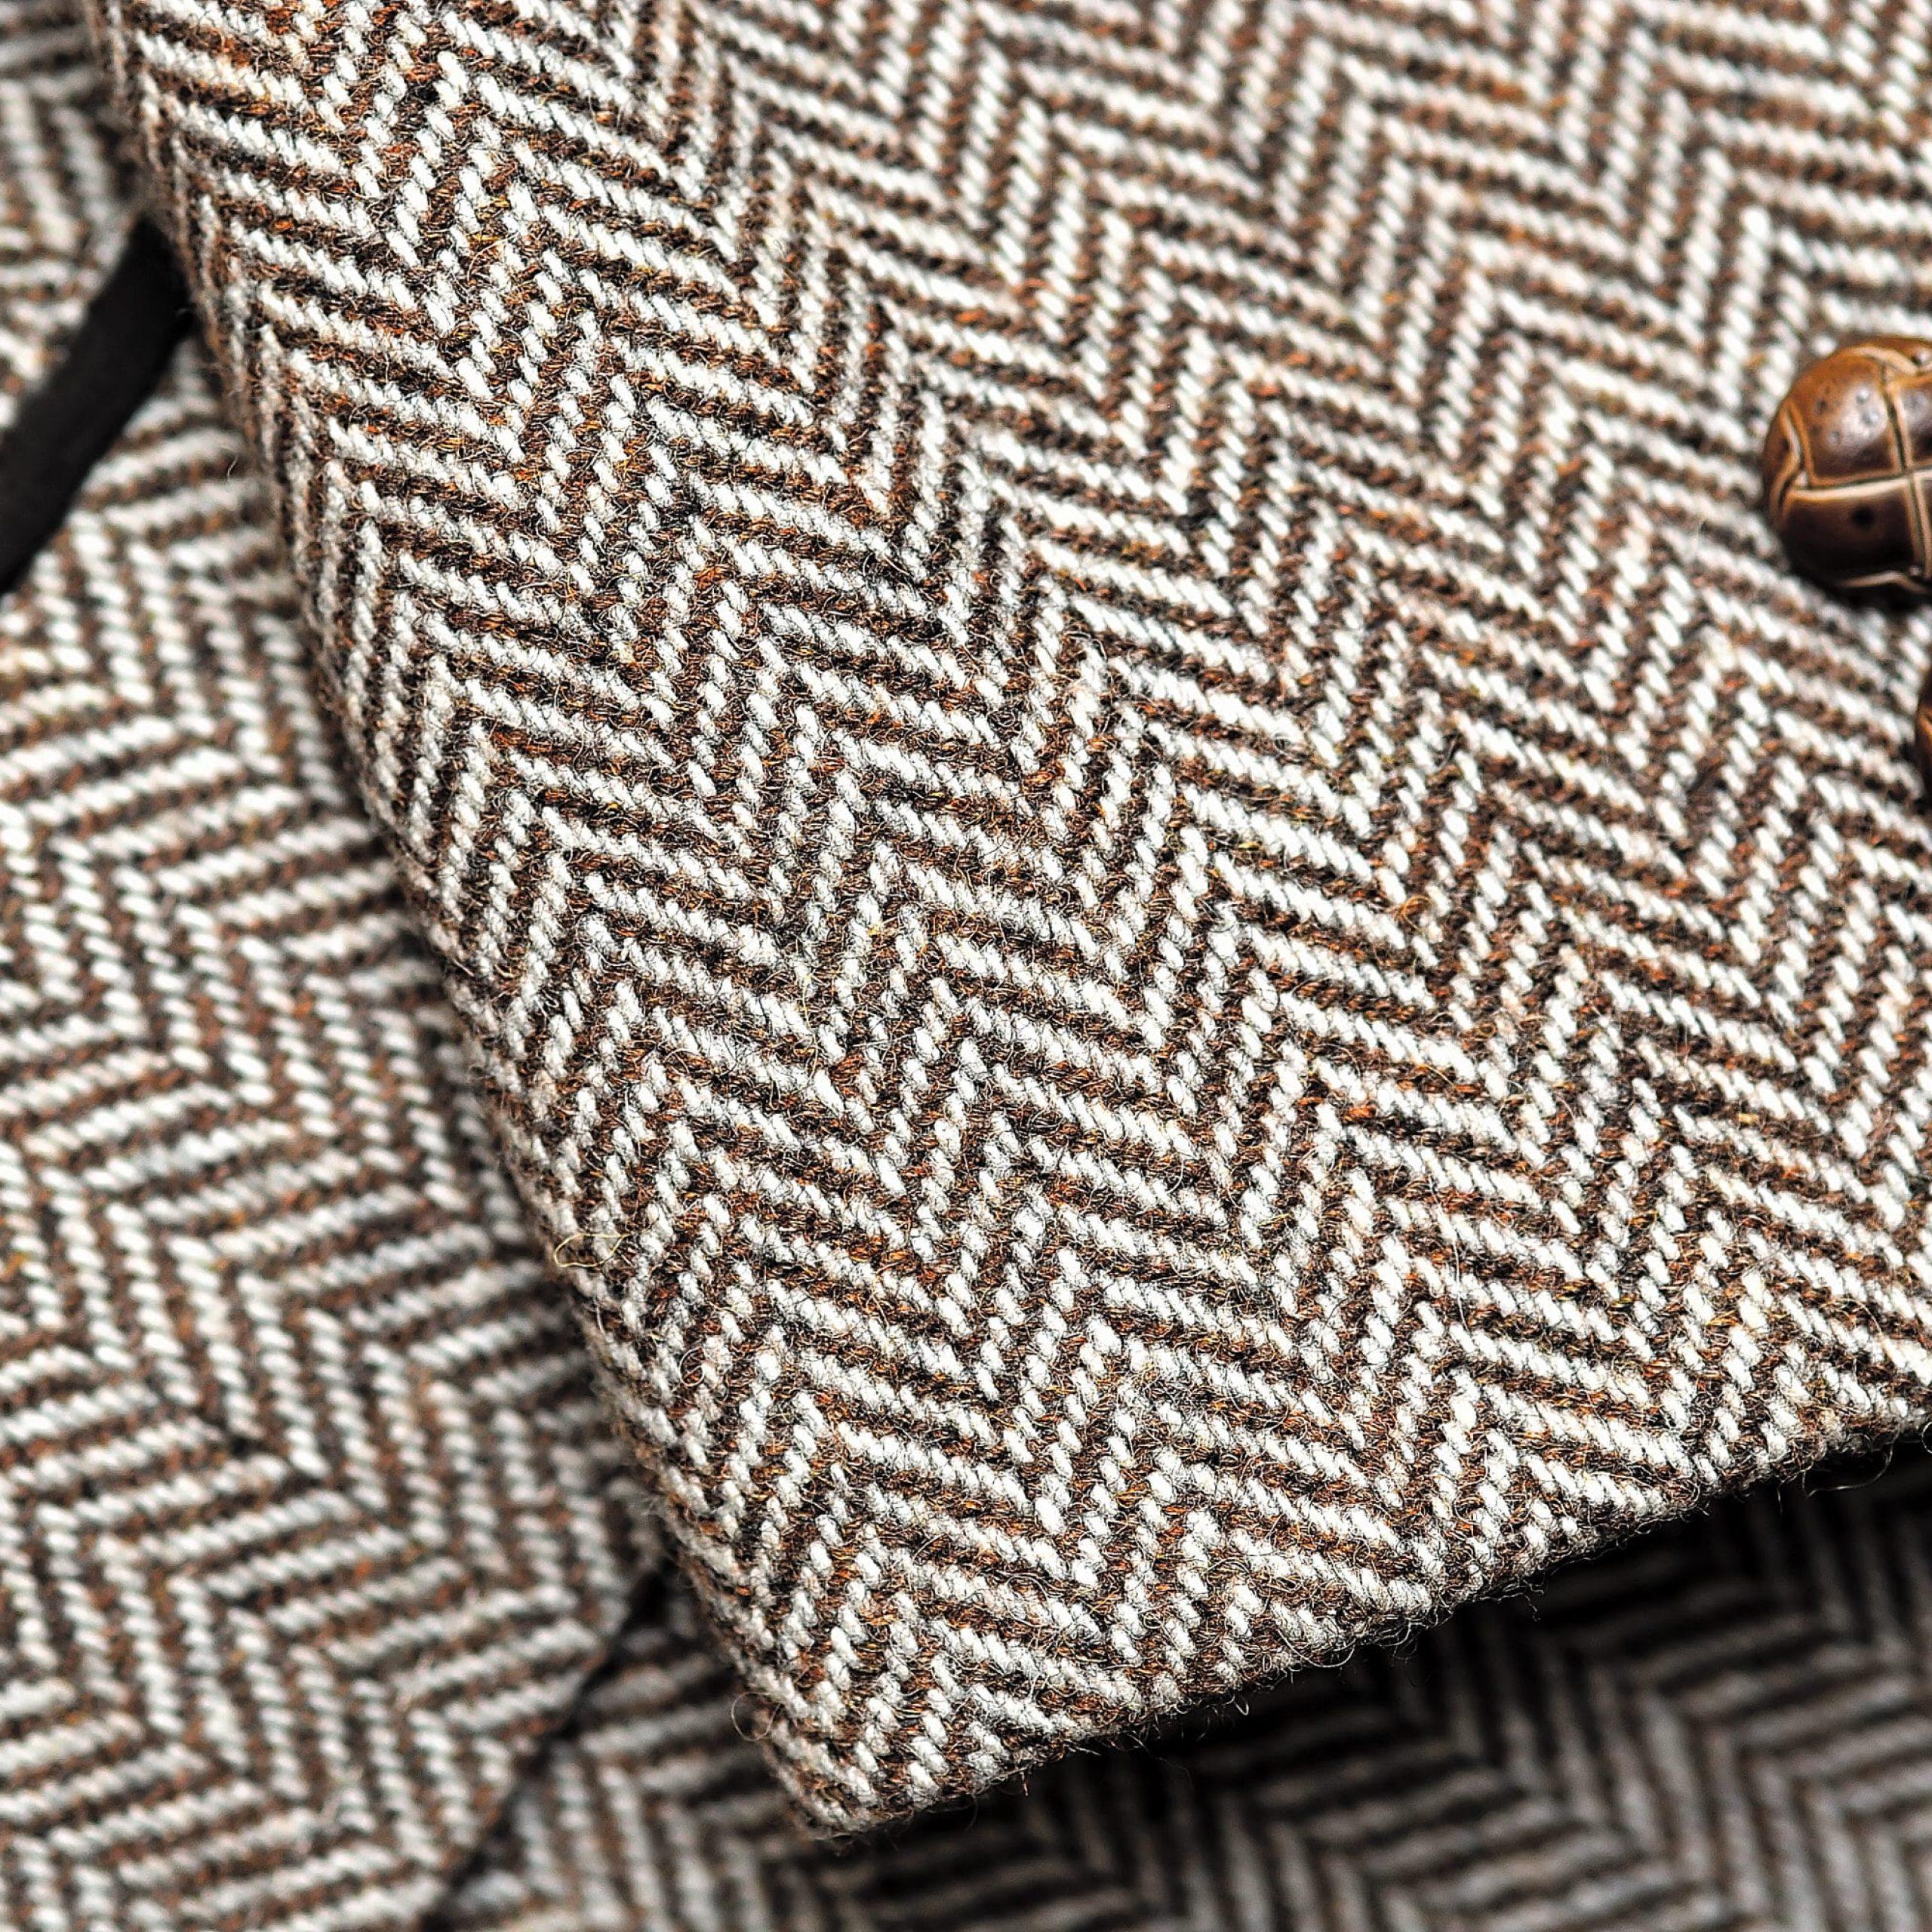 The Wonderful World of Weave Patterns